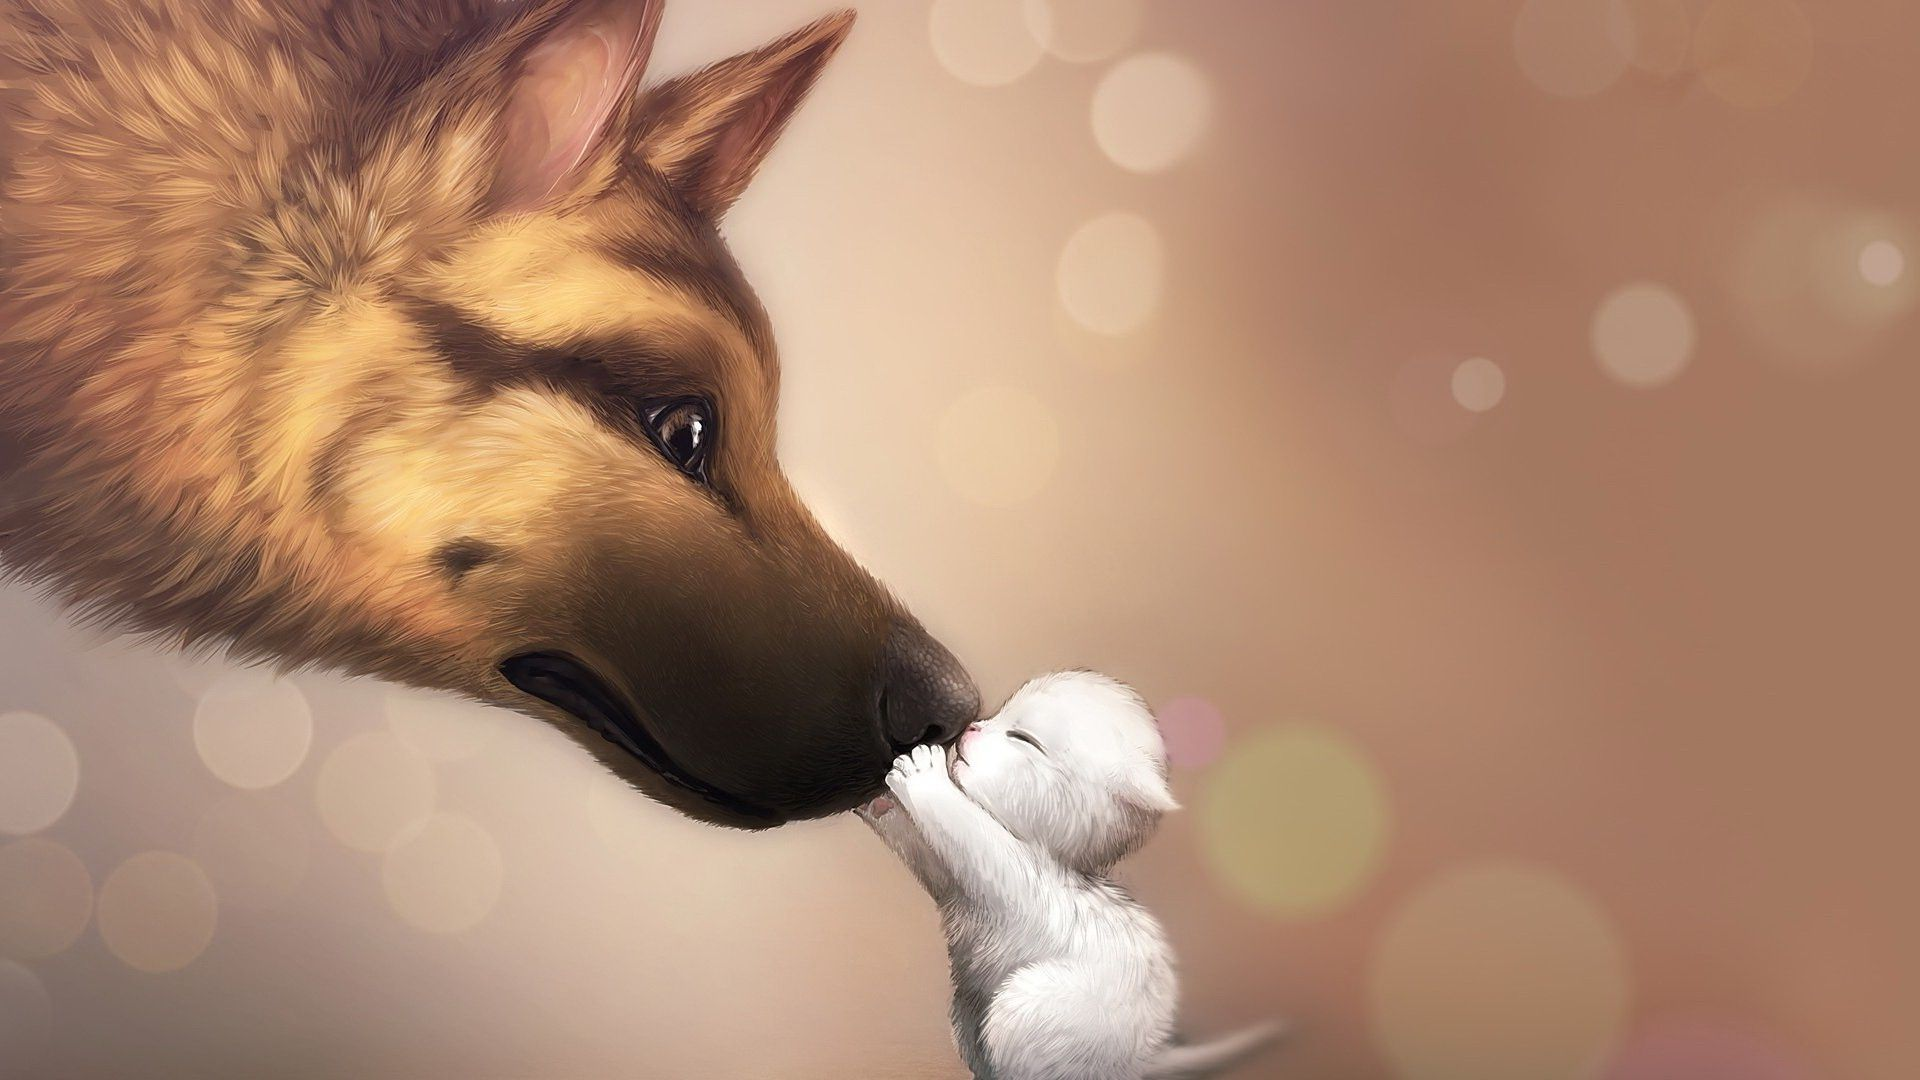 Download hd wallpapers of 840 anime Bokeh Artwork Dog Cat 1920x1080